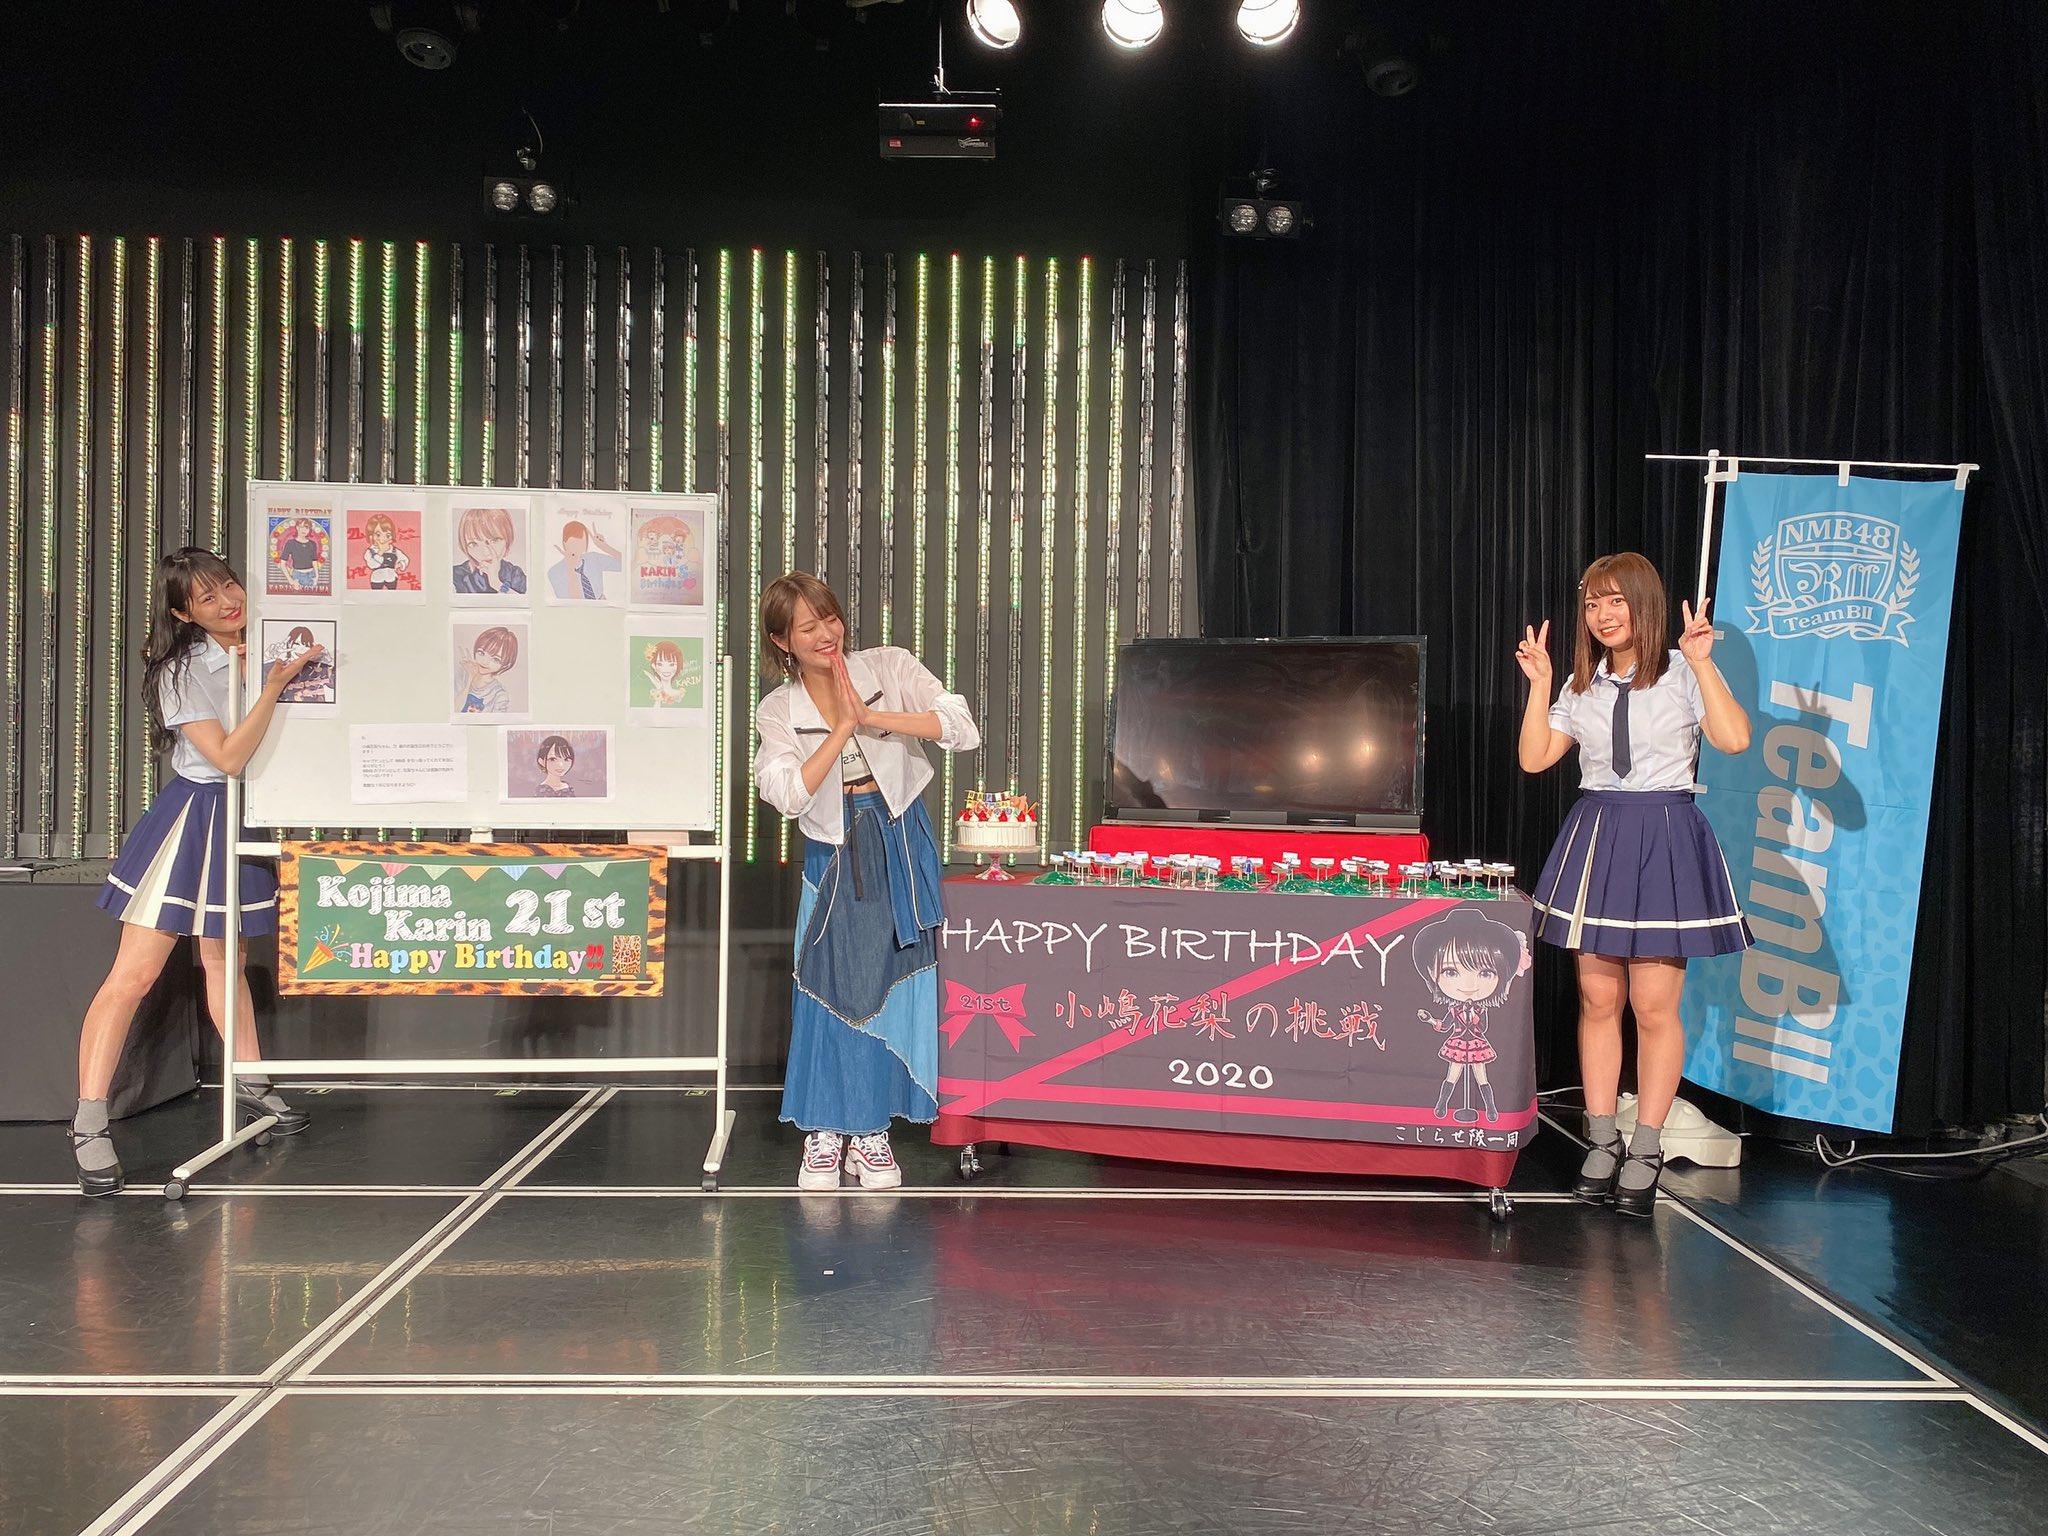 NMB48小嶋花梨「有名になる!」腹チラ衣装で決意表明【画像3枚】の画像002